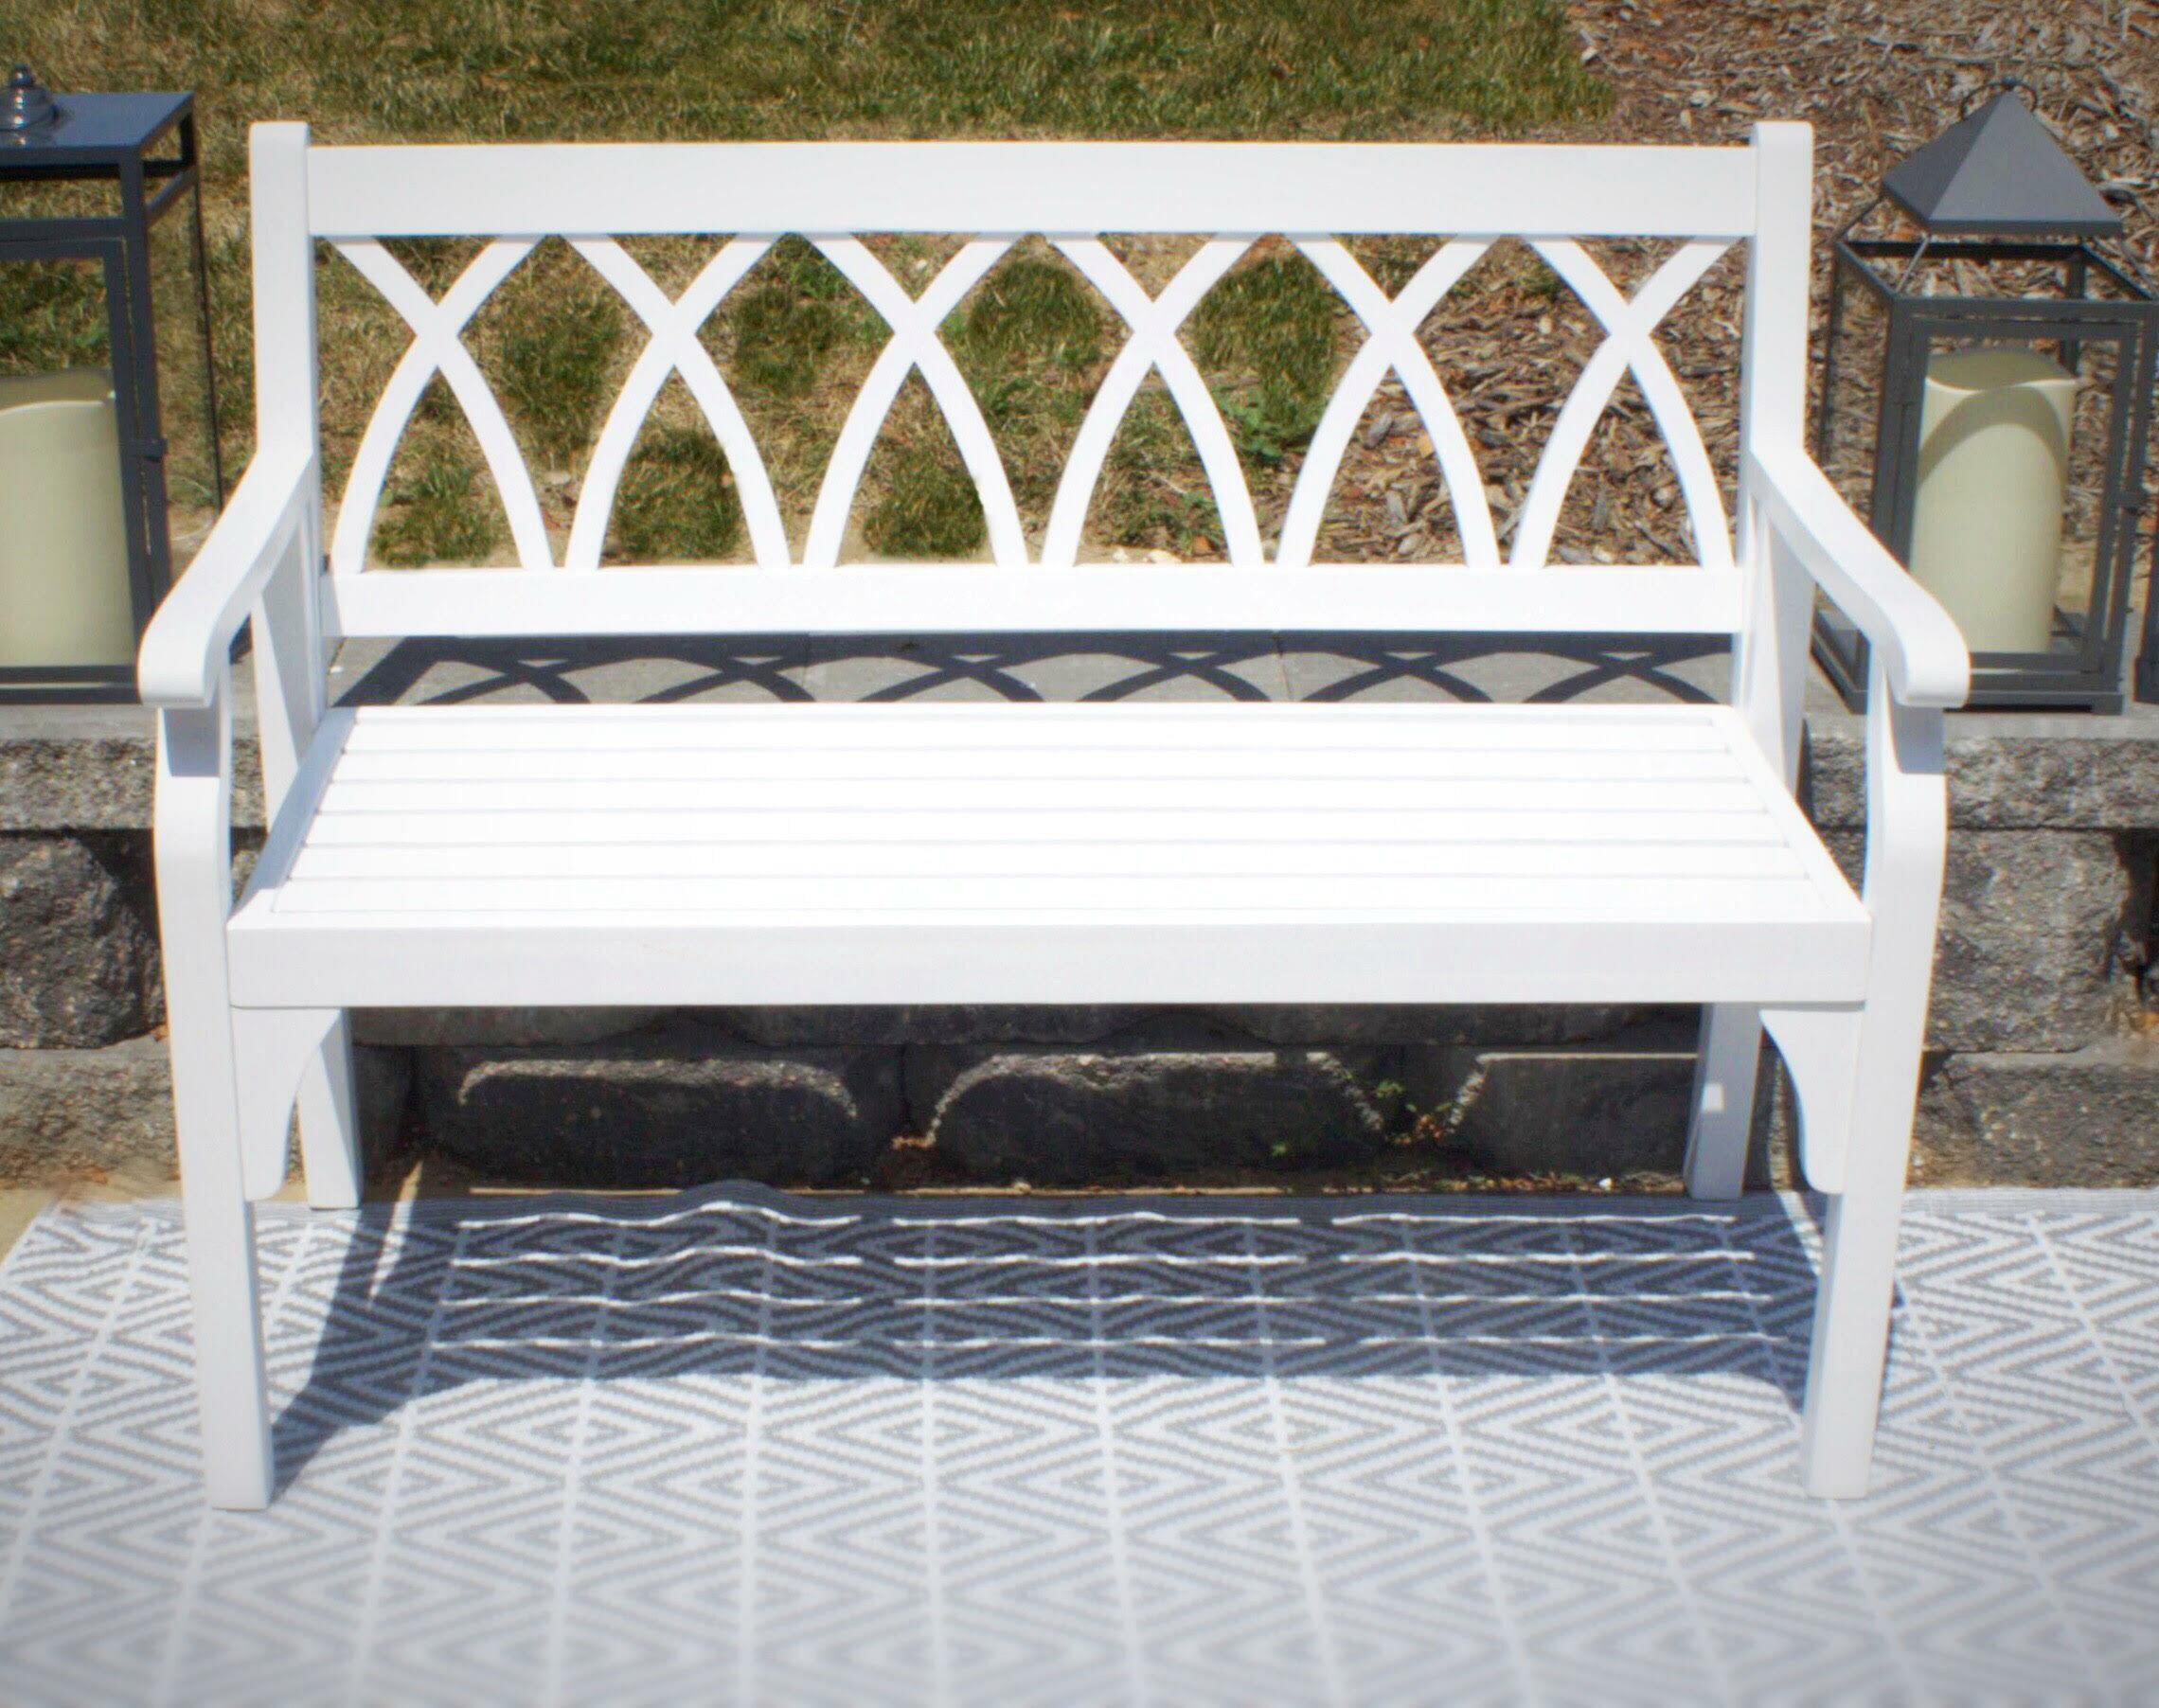 Dolores Elegant Outdoor Wooden Garden Bench With Amabel Patio Diamond Wooden Garden Benches (View 7 of 25)